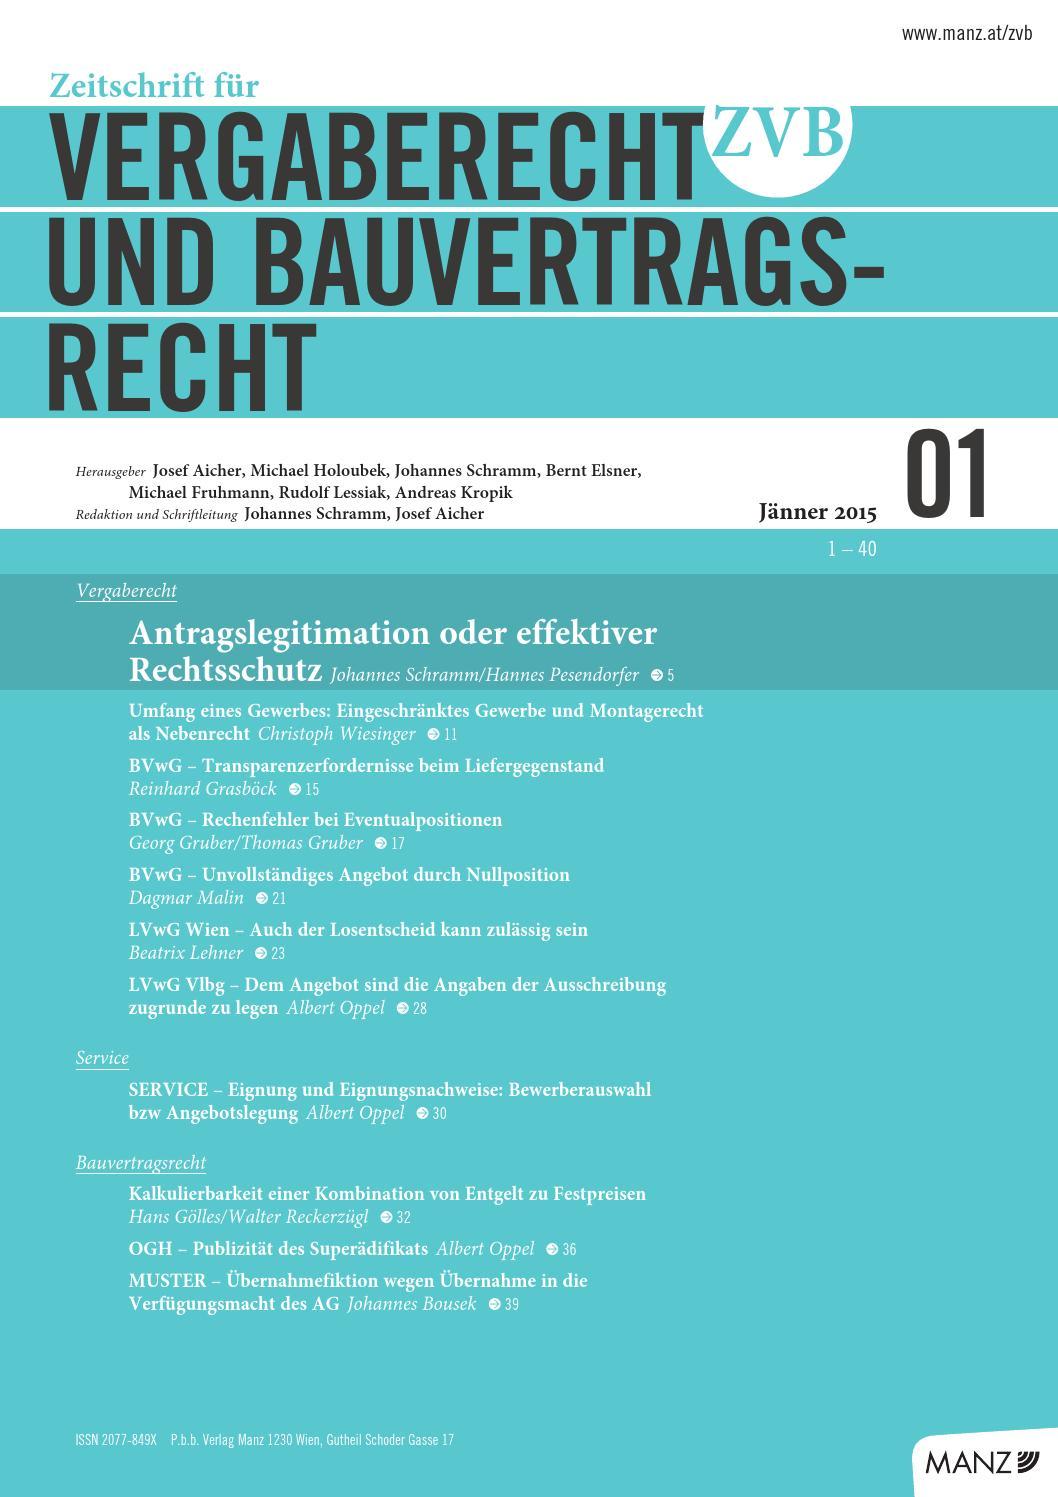 Zvb 012015 By Manzsche Verlags U Universitätsbuchhandlung Gmbh